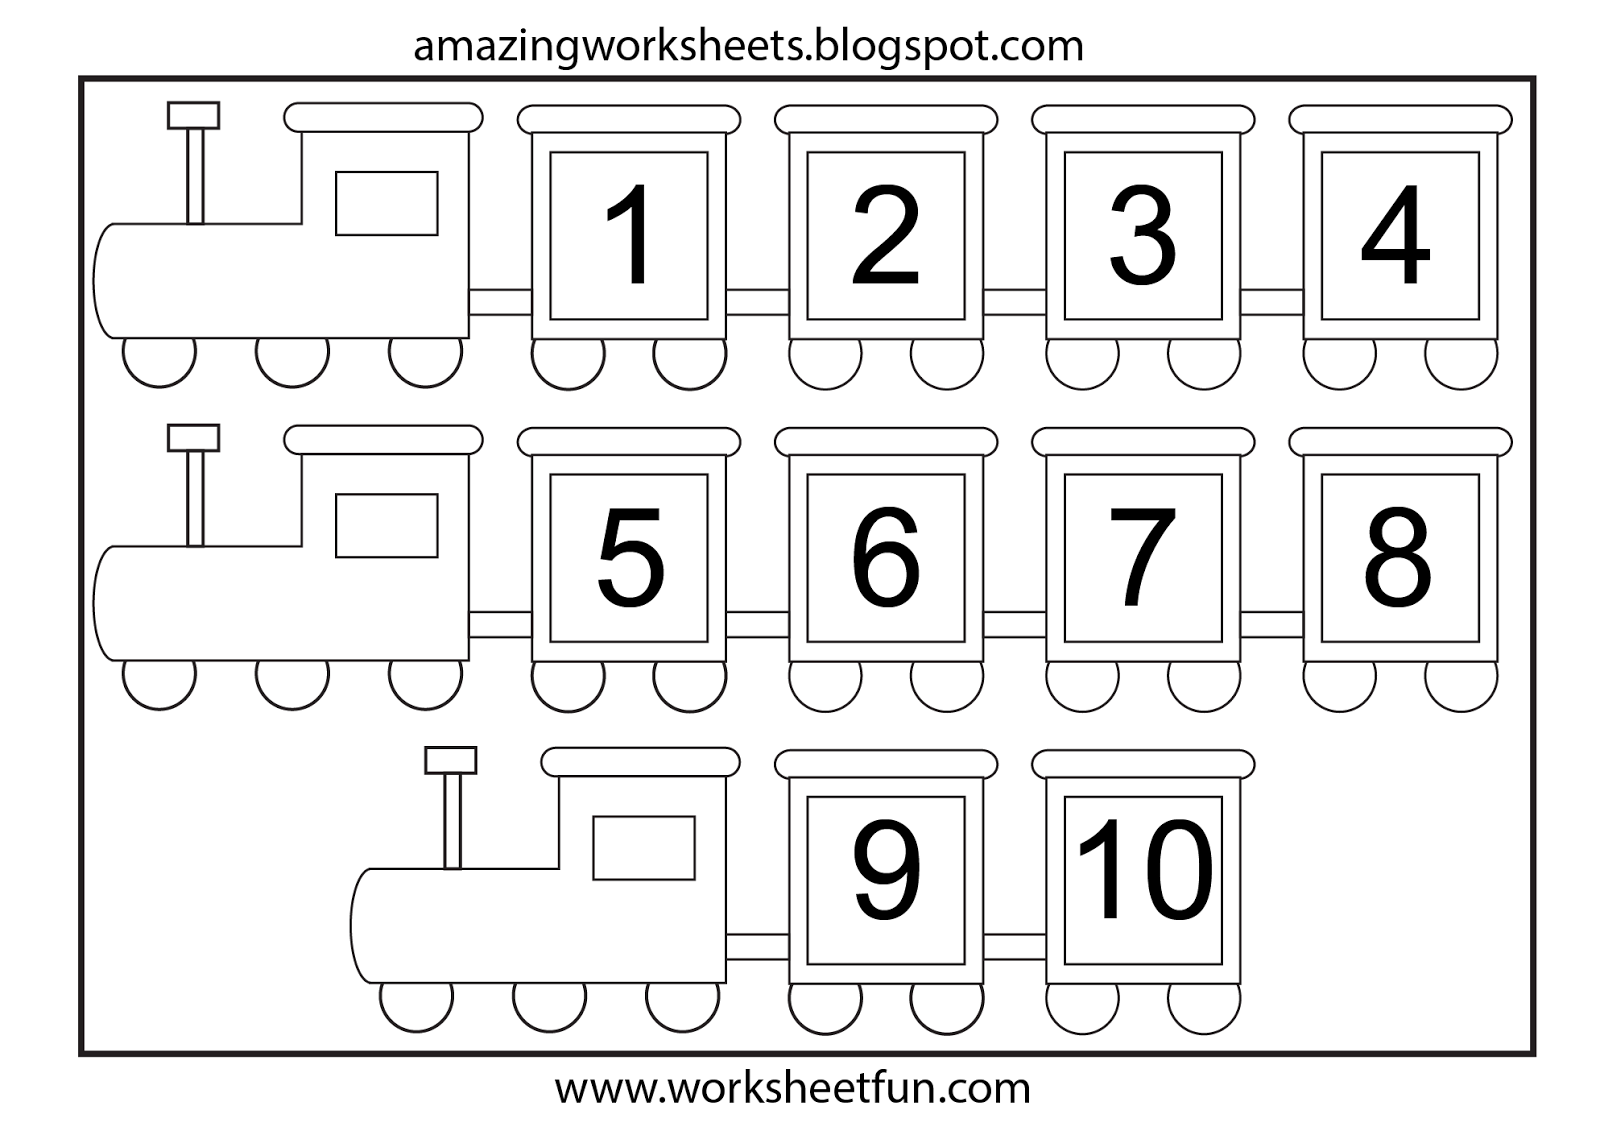 Worksheetfun Free Printable Worksheets With Images